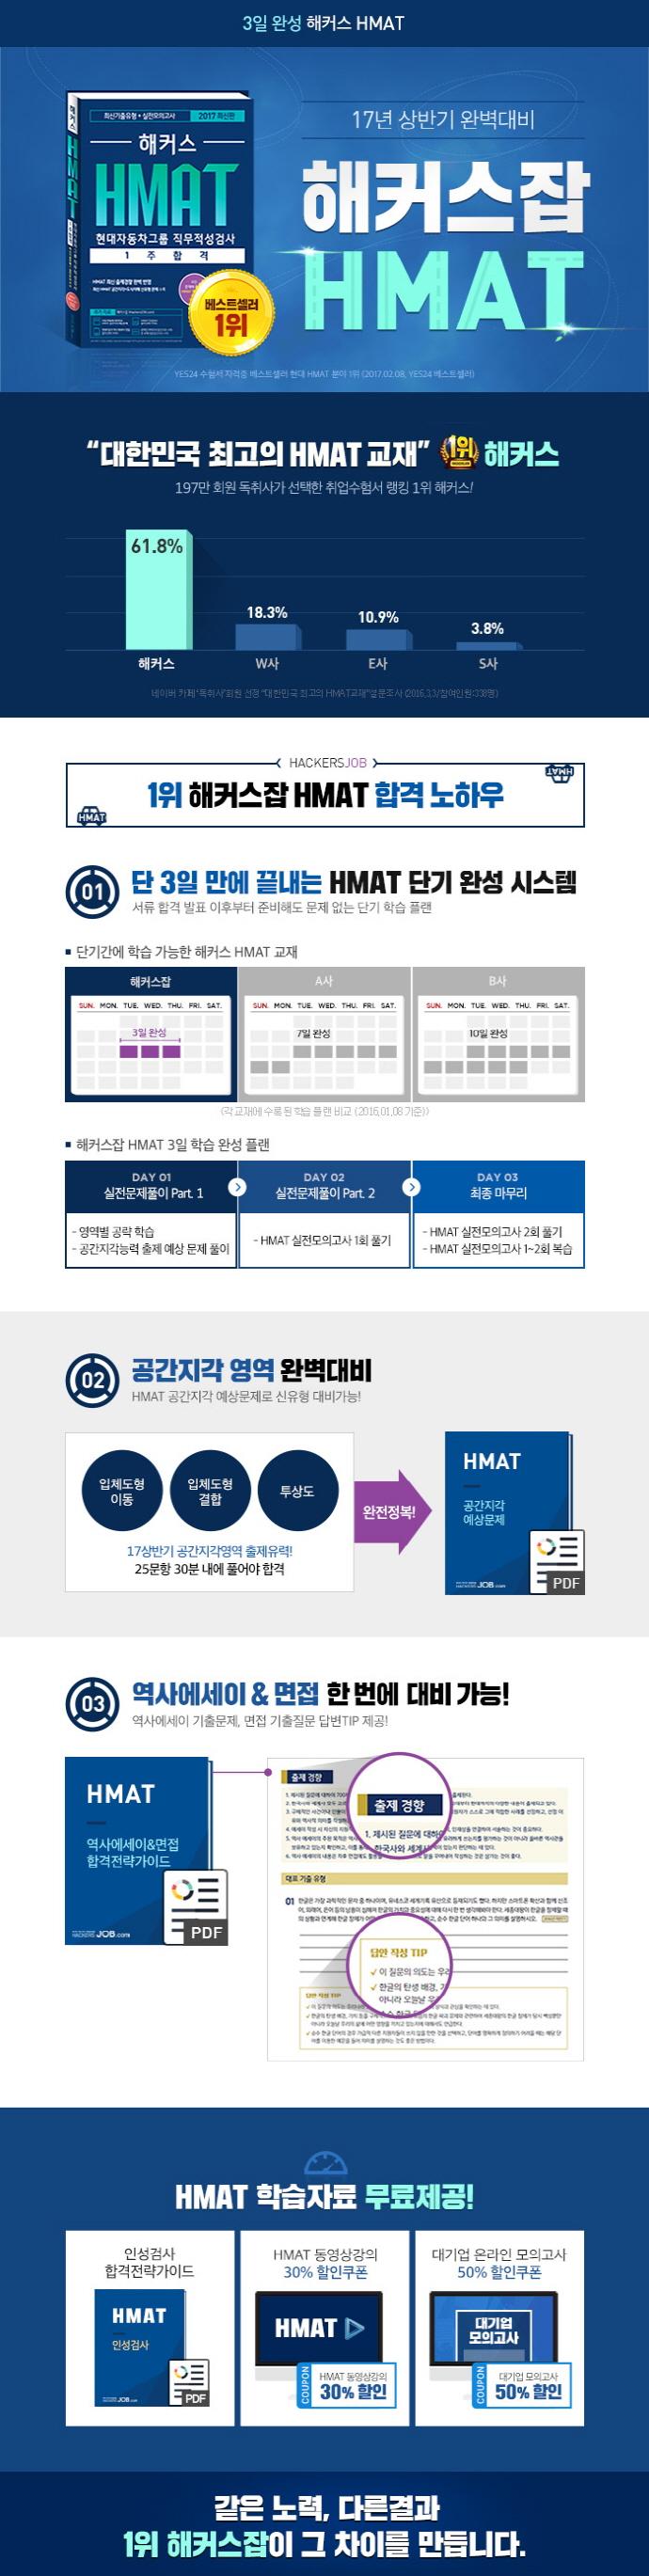 HMAT 현대자동차그룹 직무적성검사 1주 합격(2017)(해커스)(개정판 3판) 도서 상세이미지